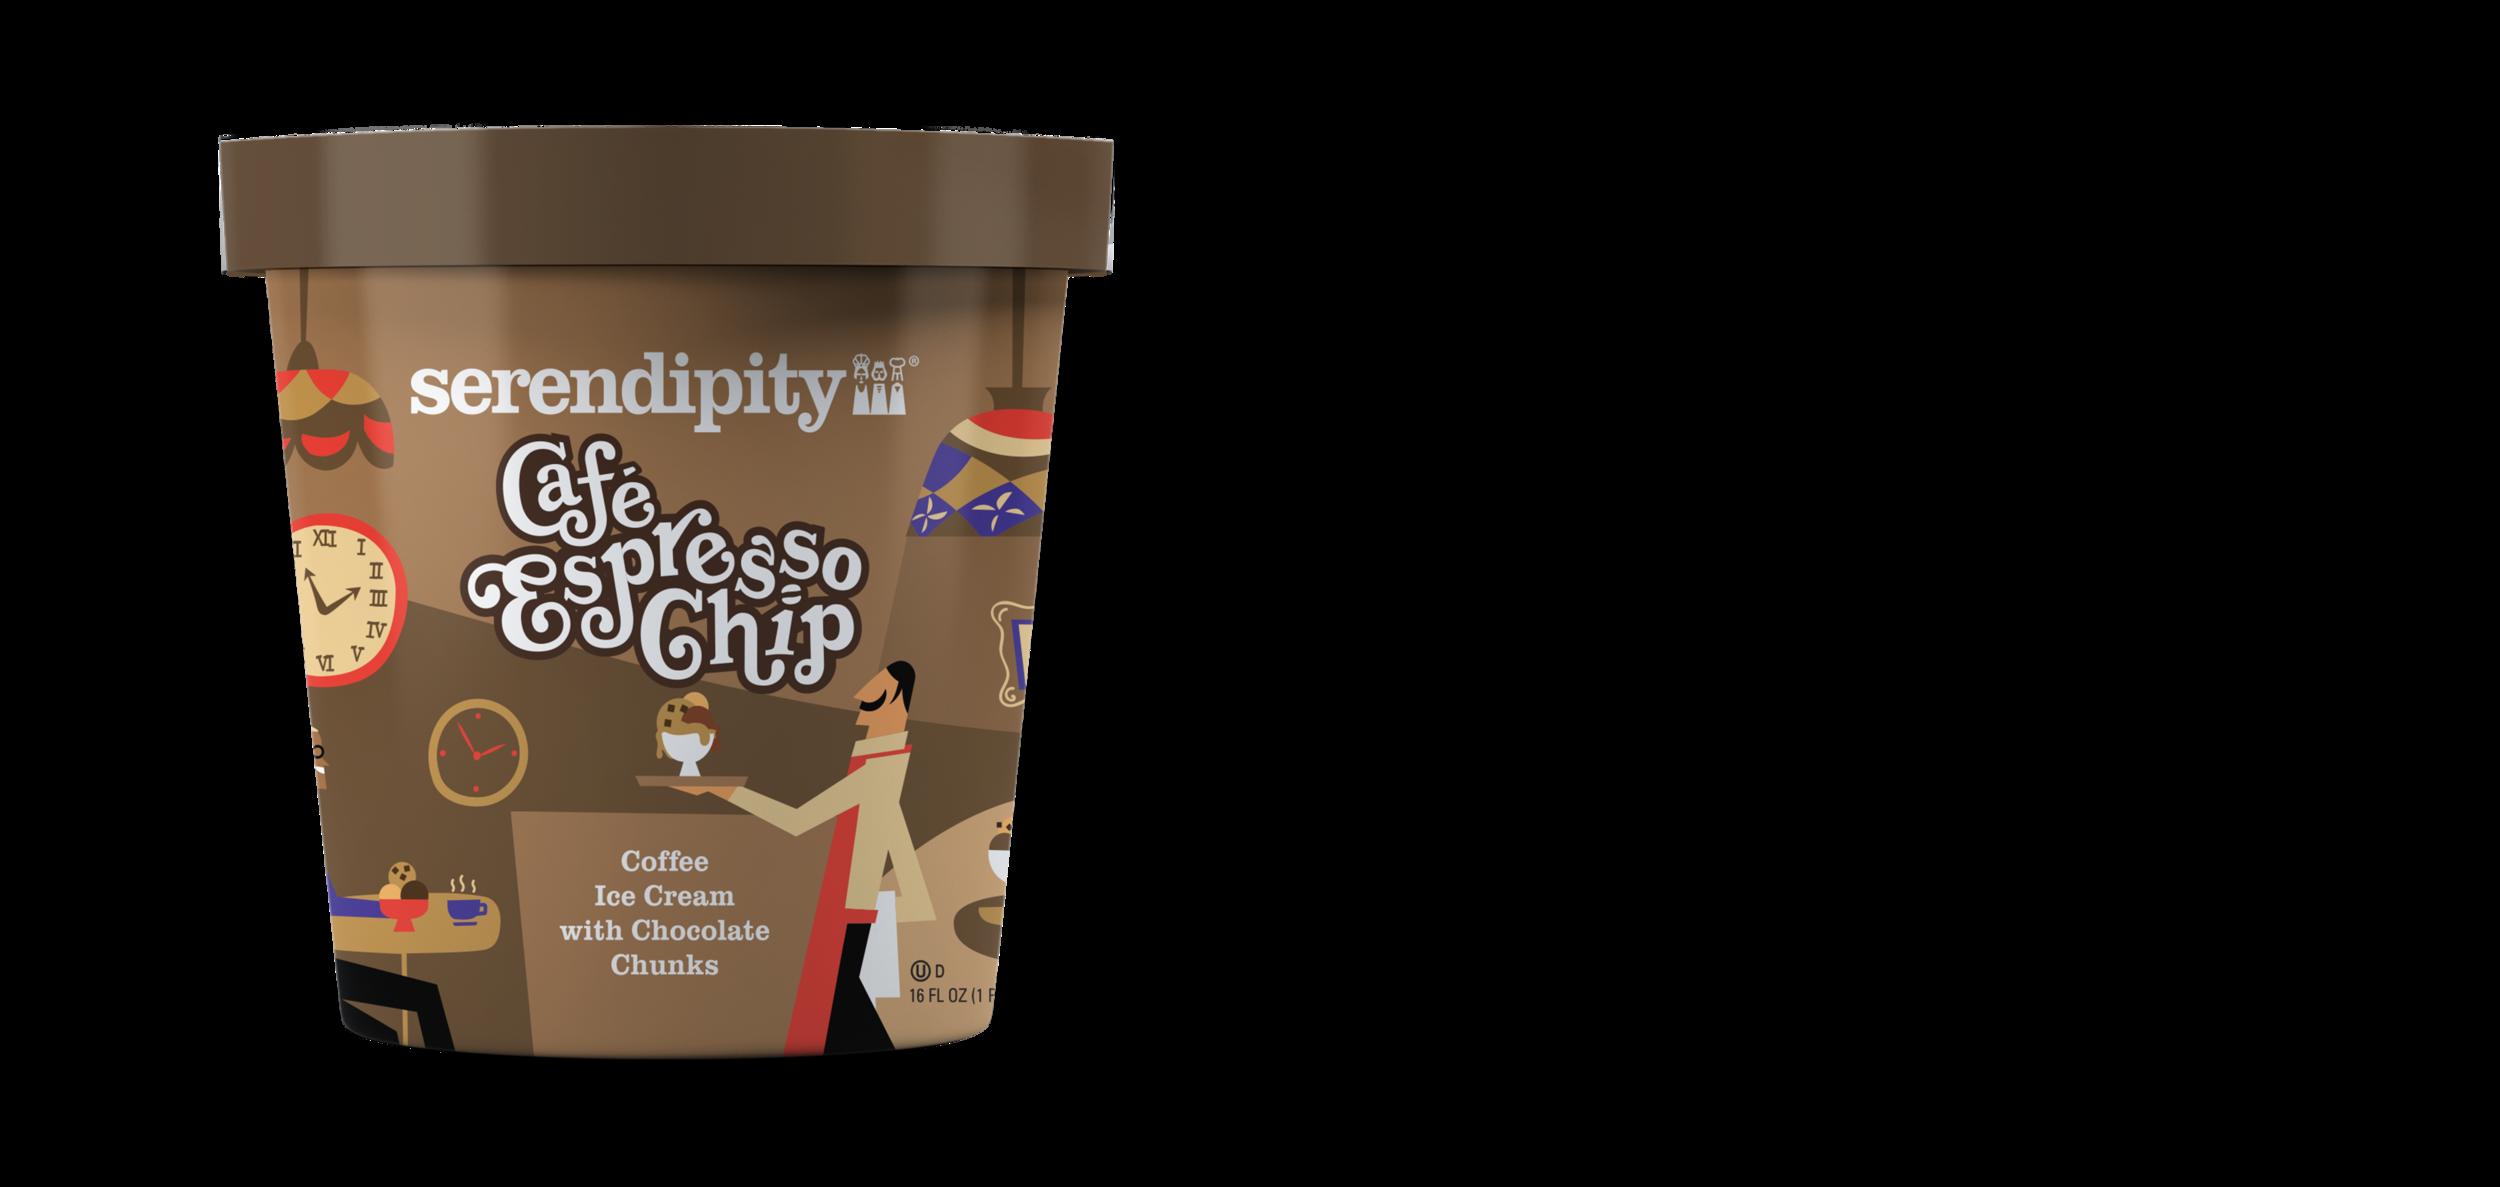 Cafe Espresso Chip - Coffee Ice Cream with Chocolate Chunks